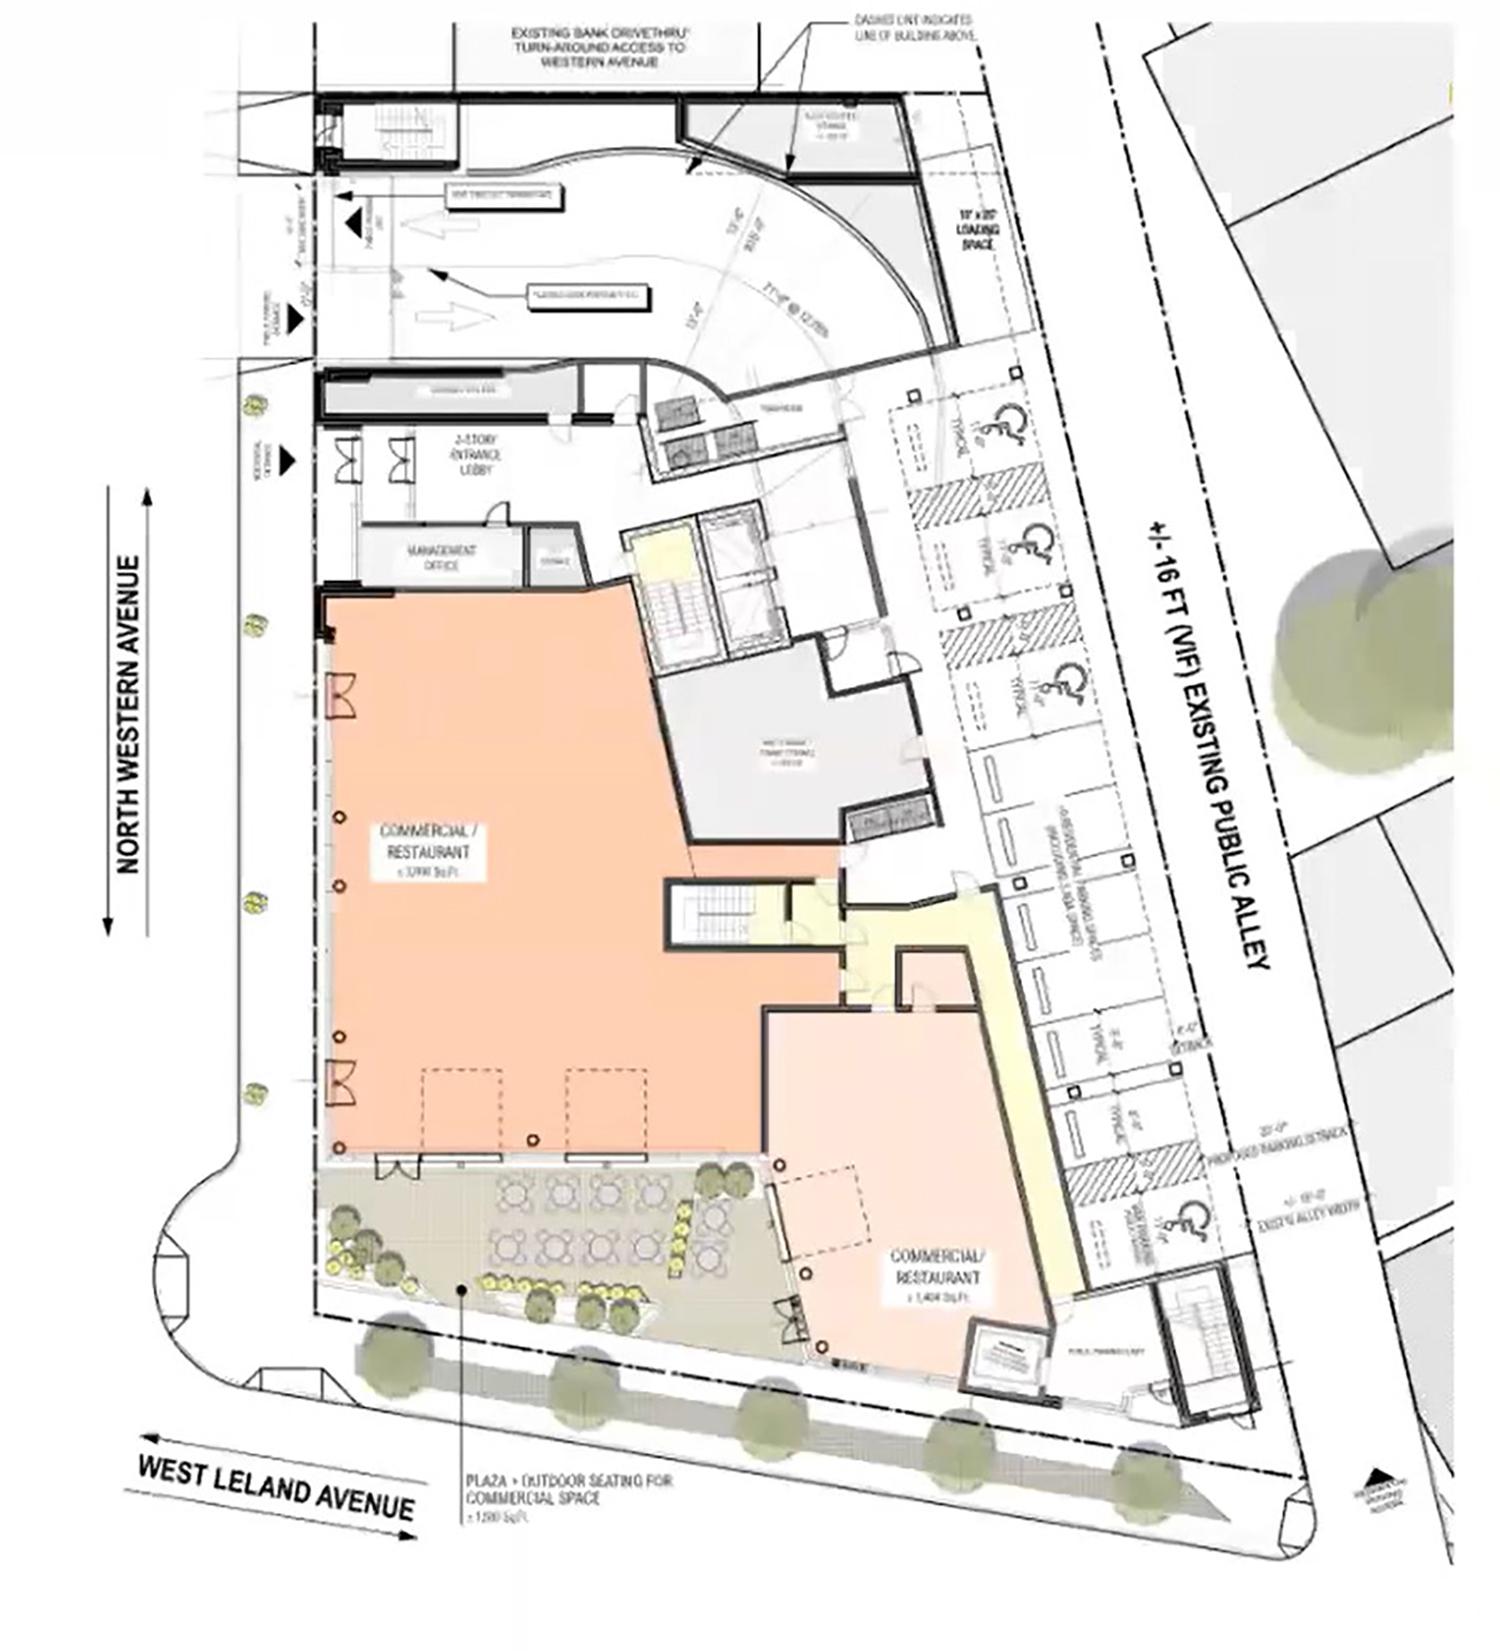 Site Plan for 4715 N Western Avenue. Drawing by DesignBridge